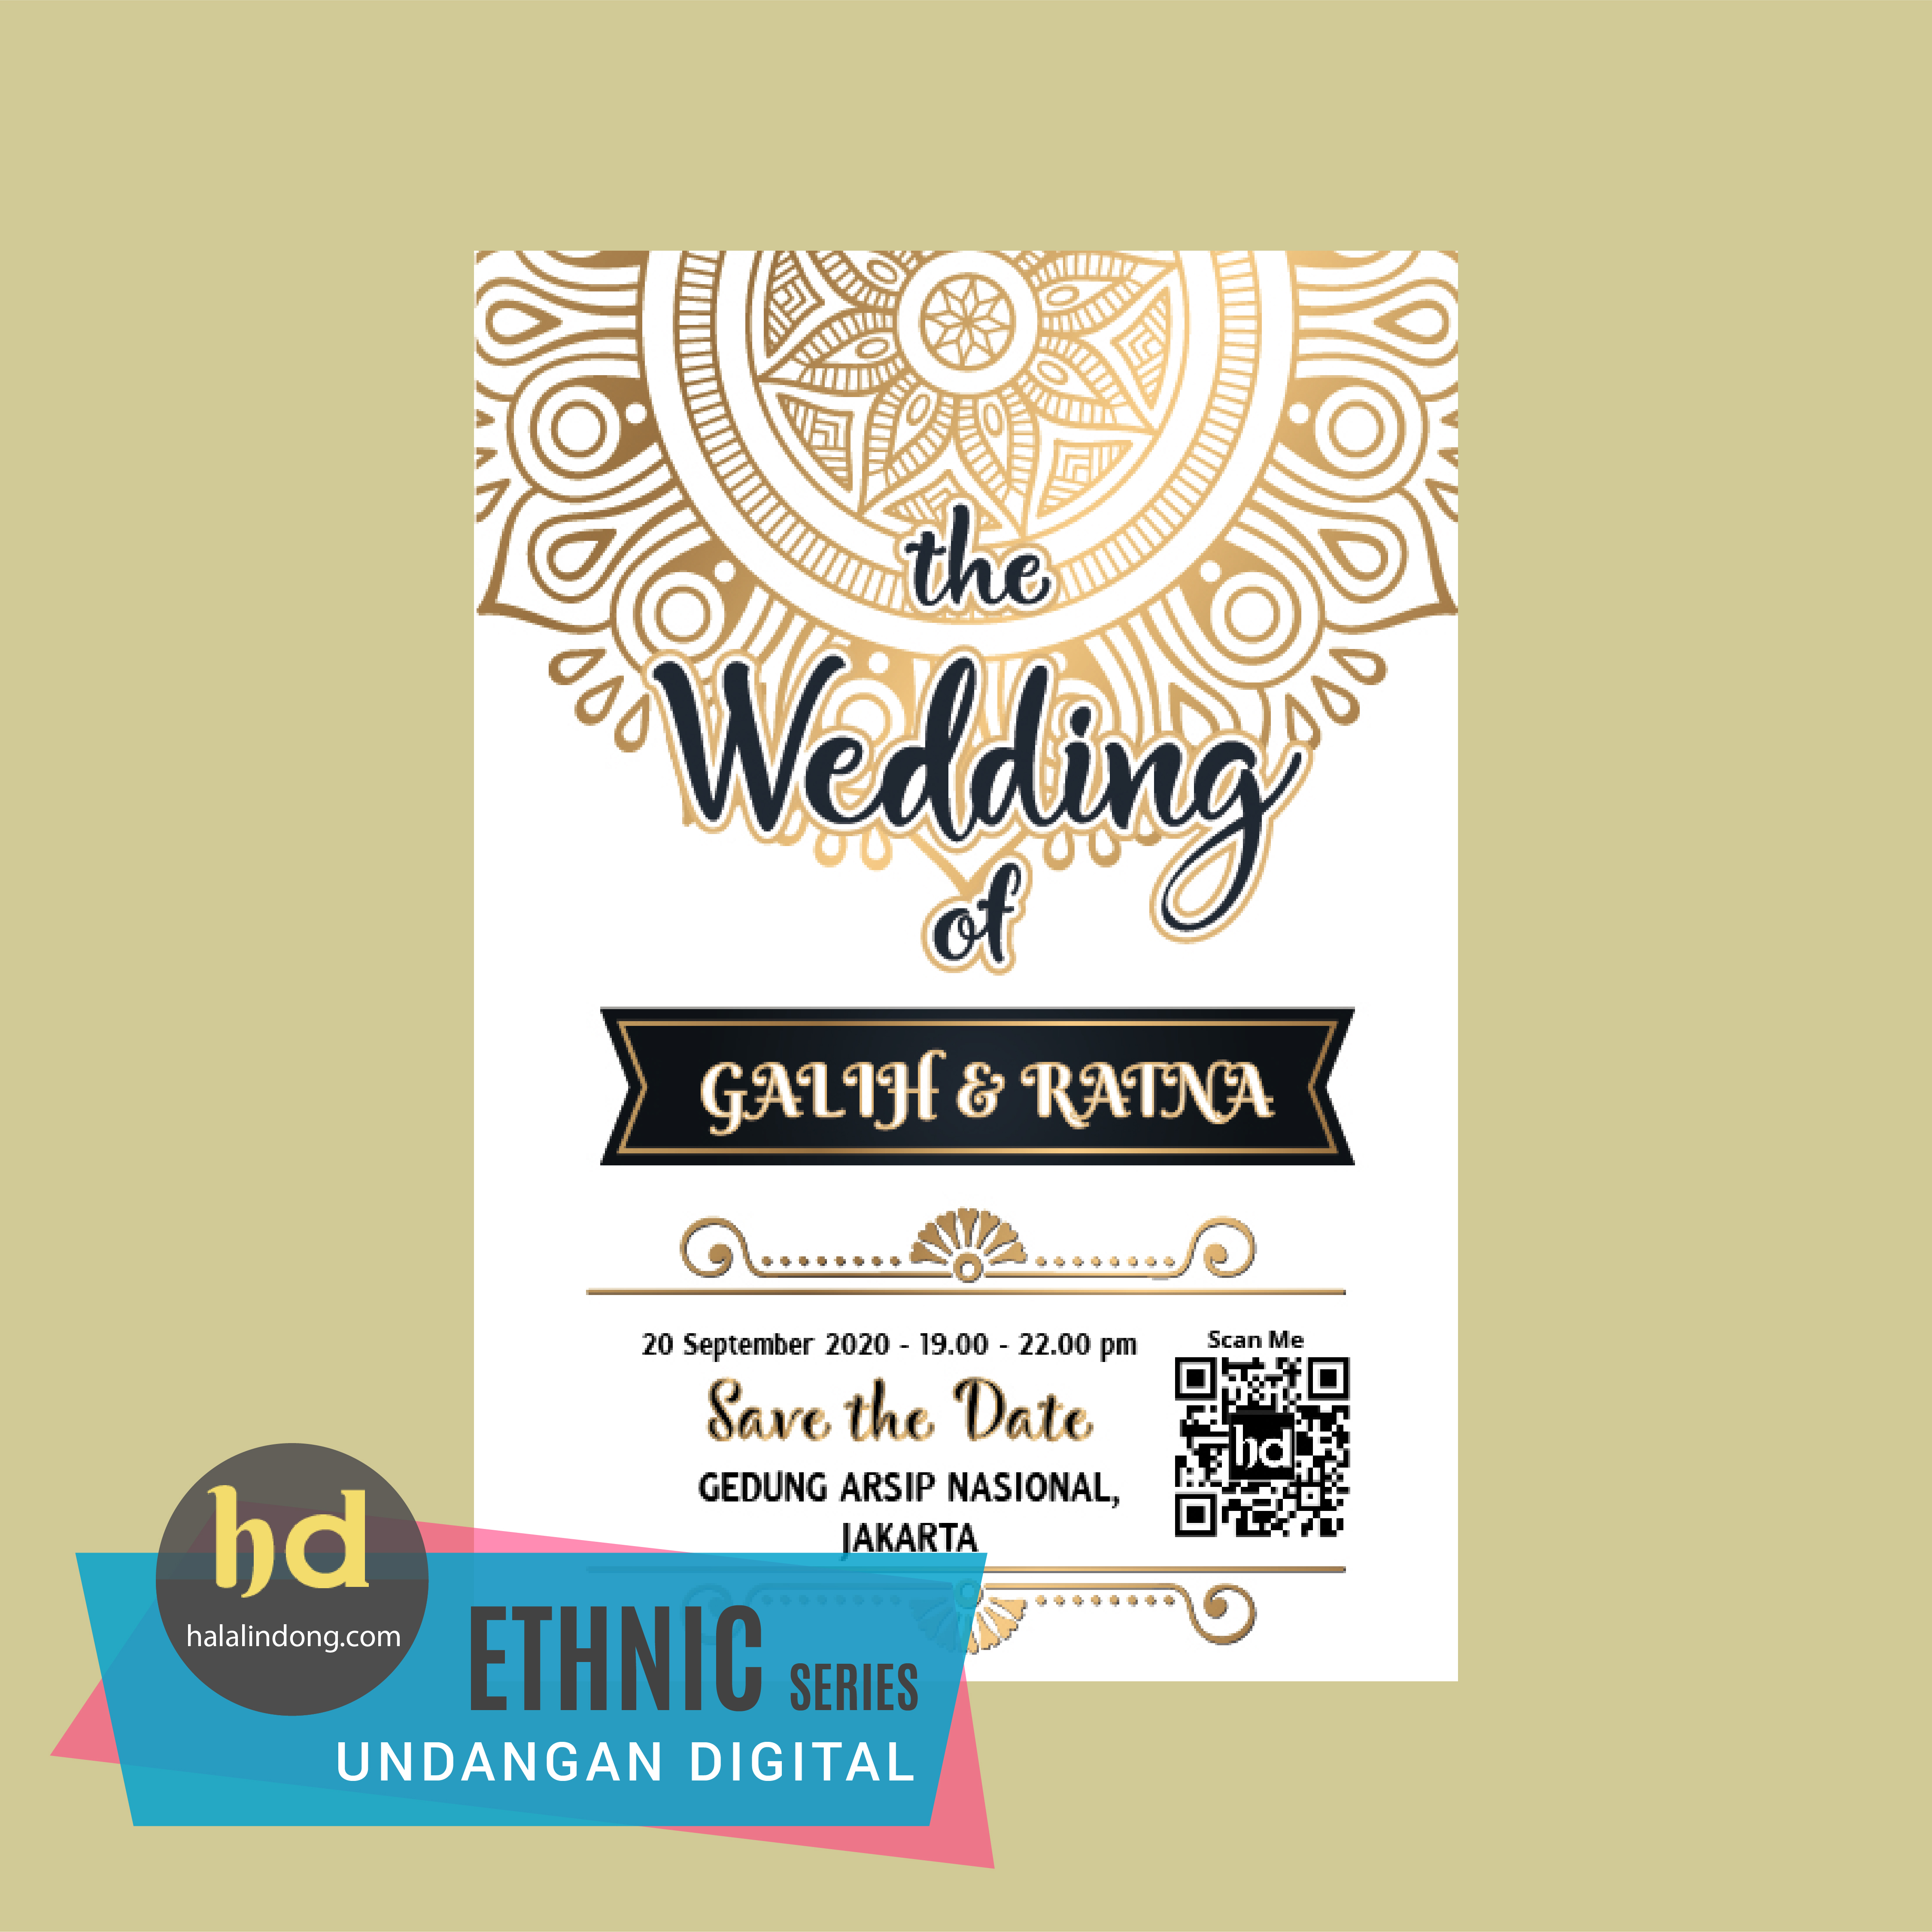 Undangan Digital By Halalindong Pernikahan  Jakarta A 02